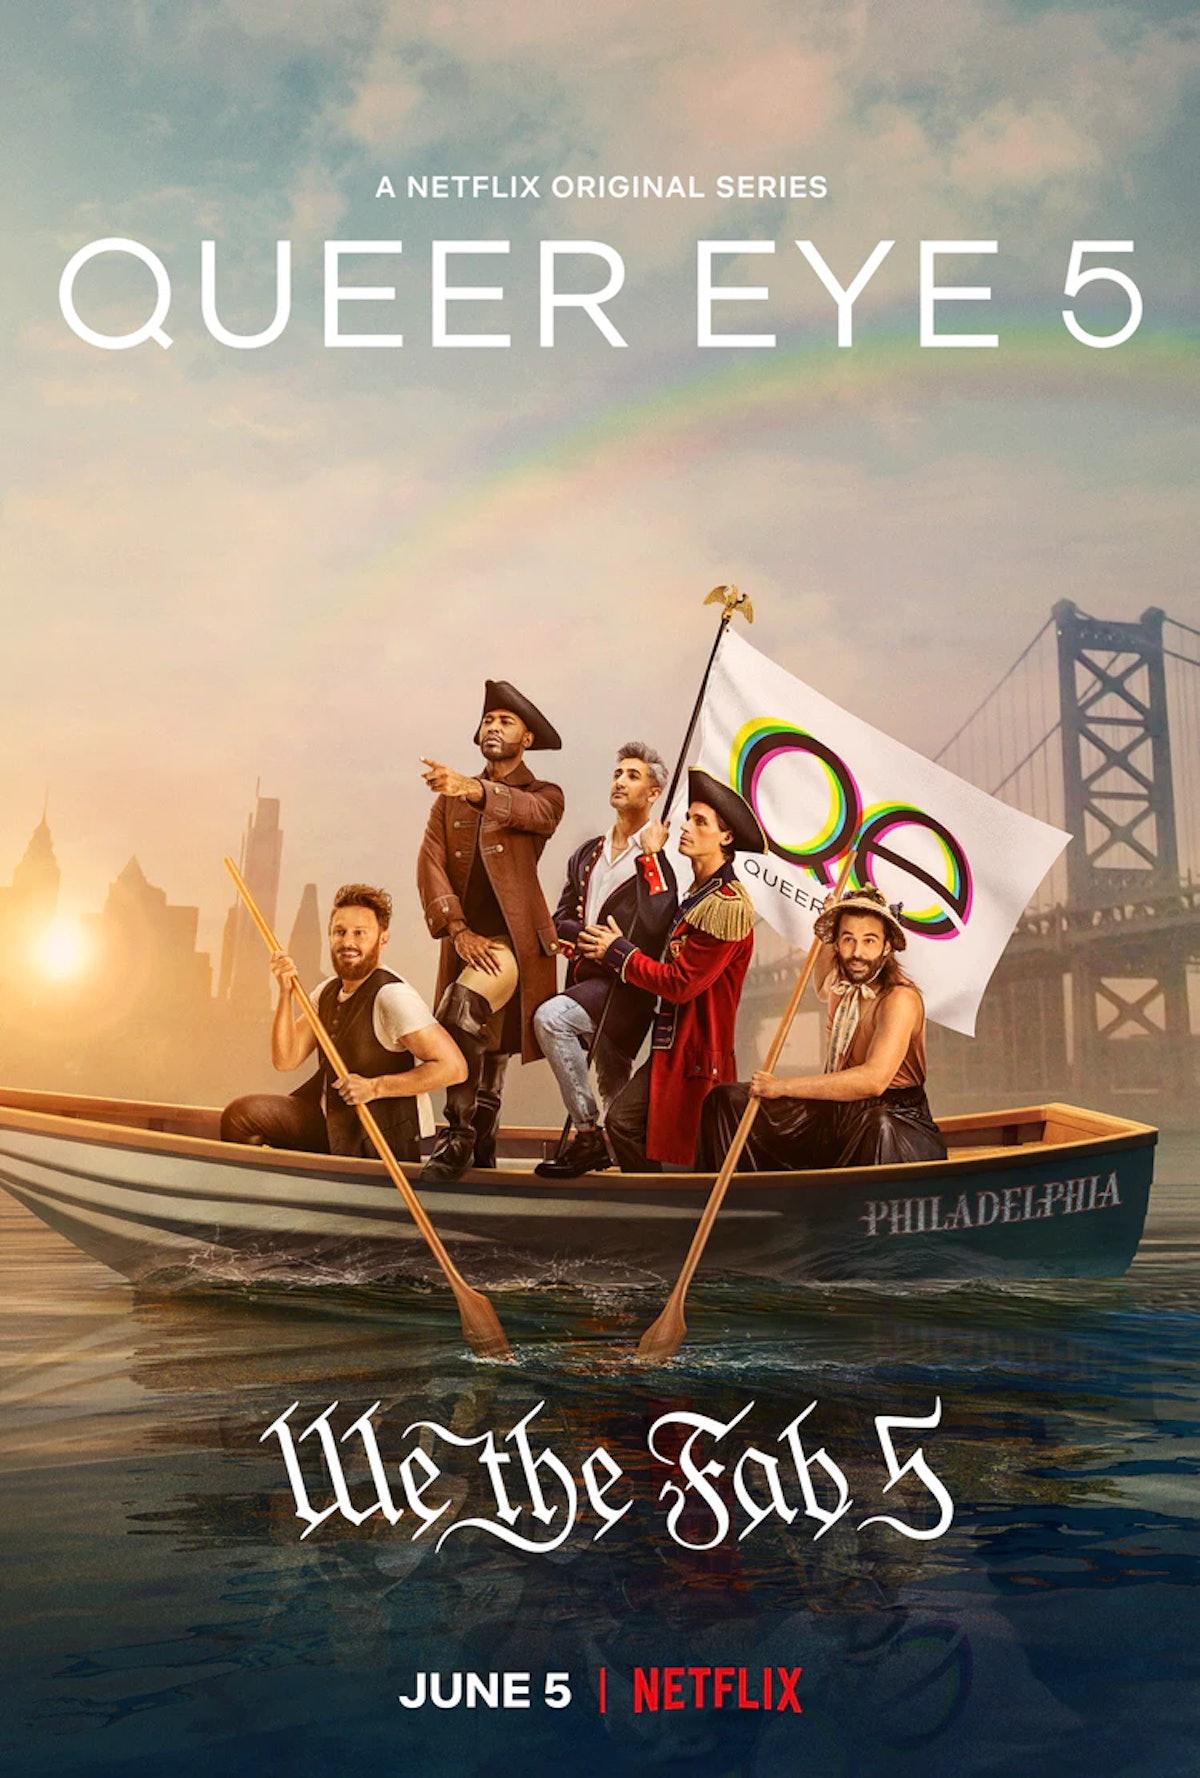 'Queer Eye' Season 5 poster